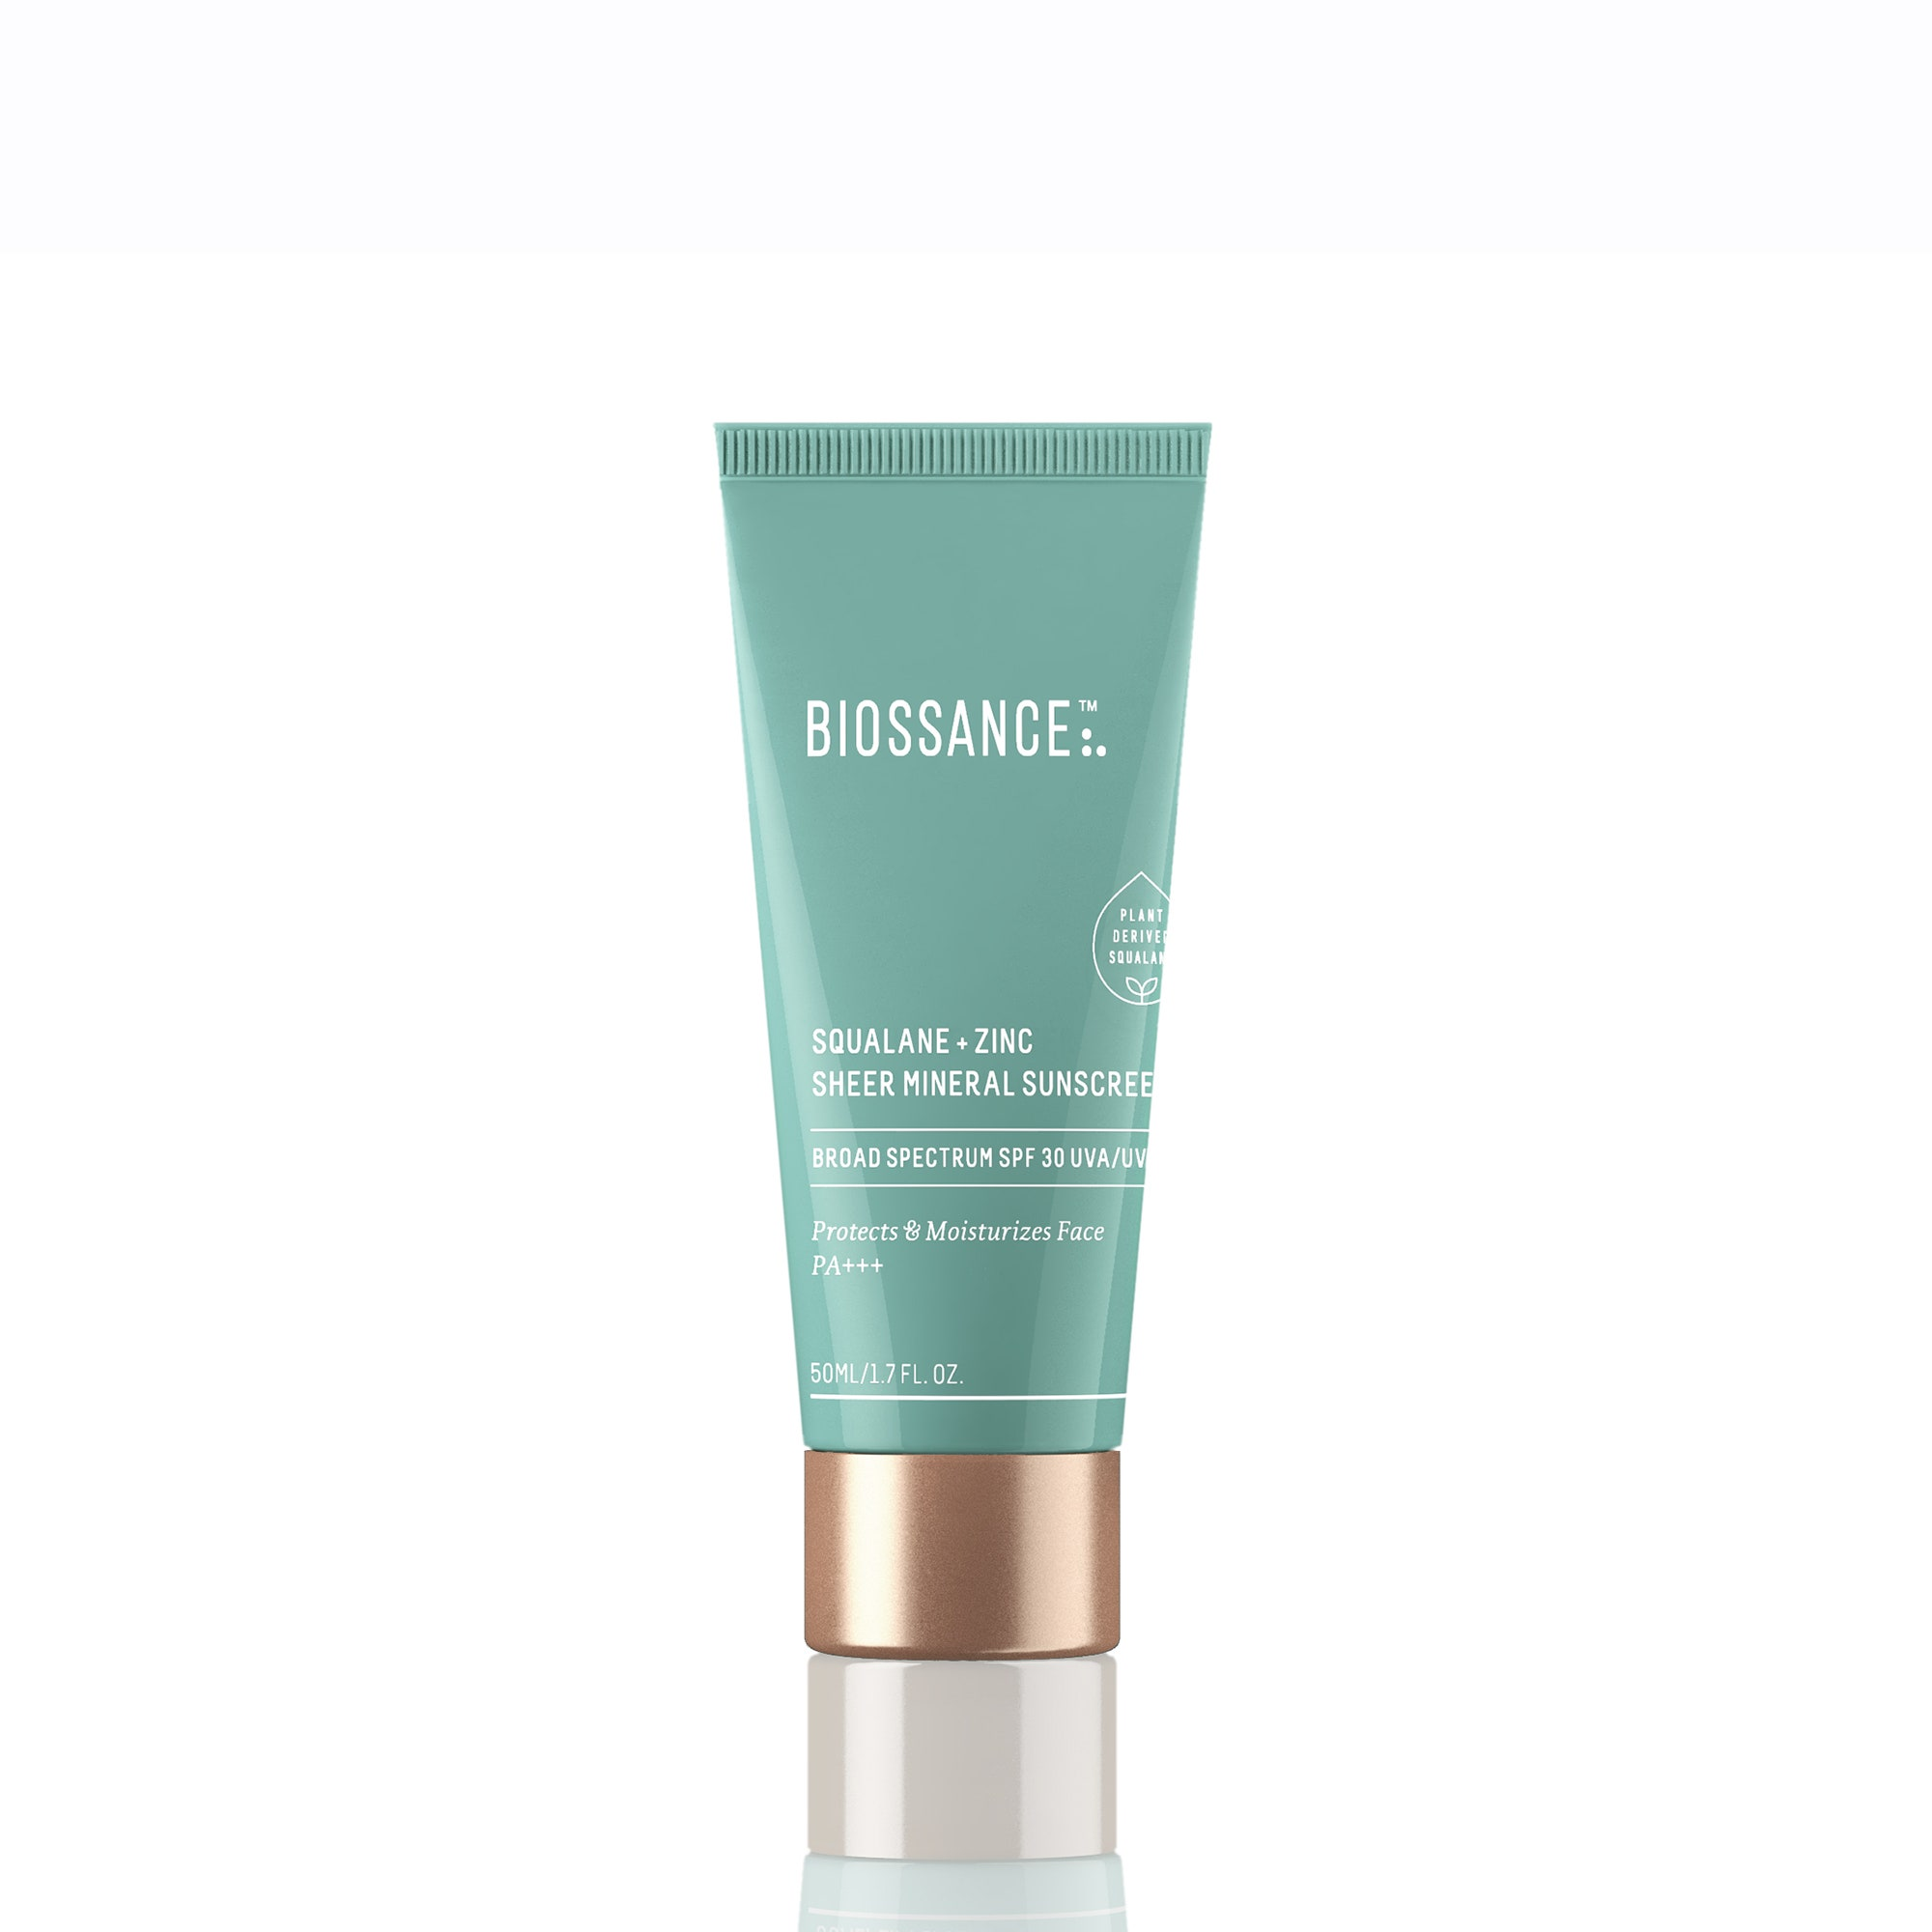 Biossance Squalane + Zinc Sheer Mineral Sunscreen